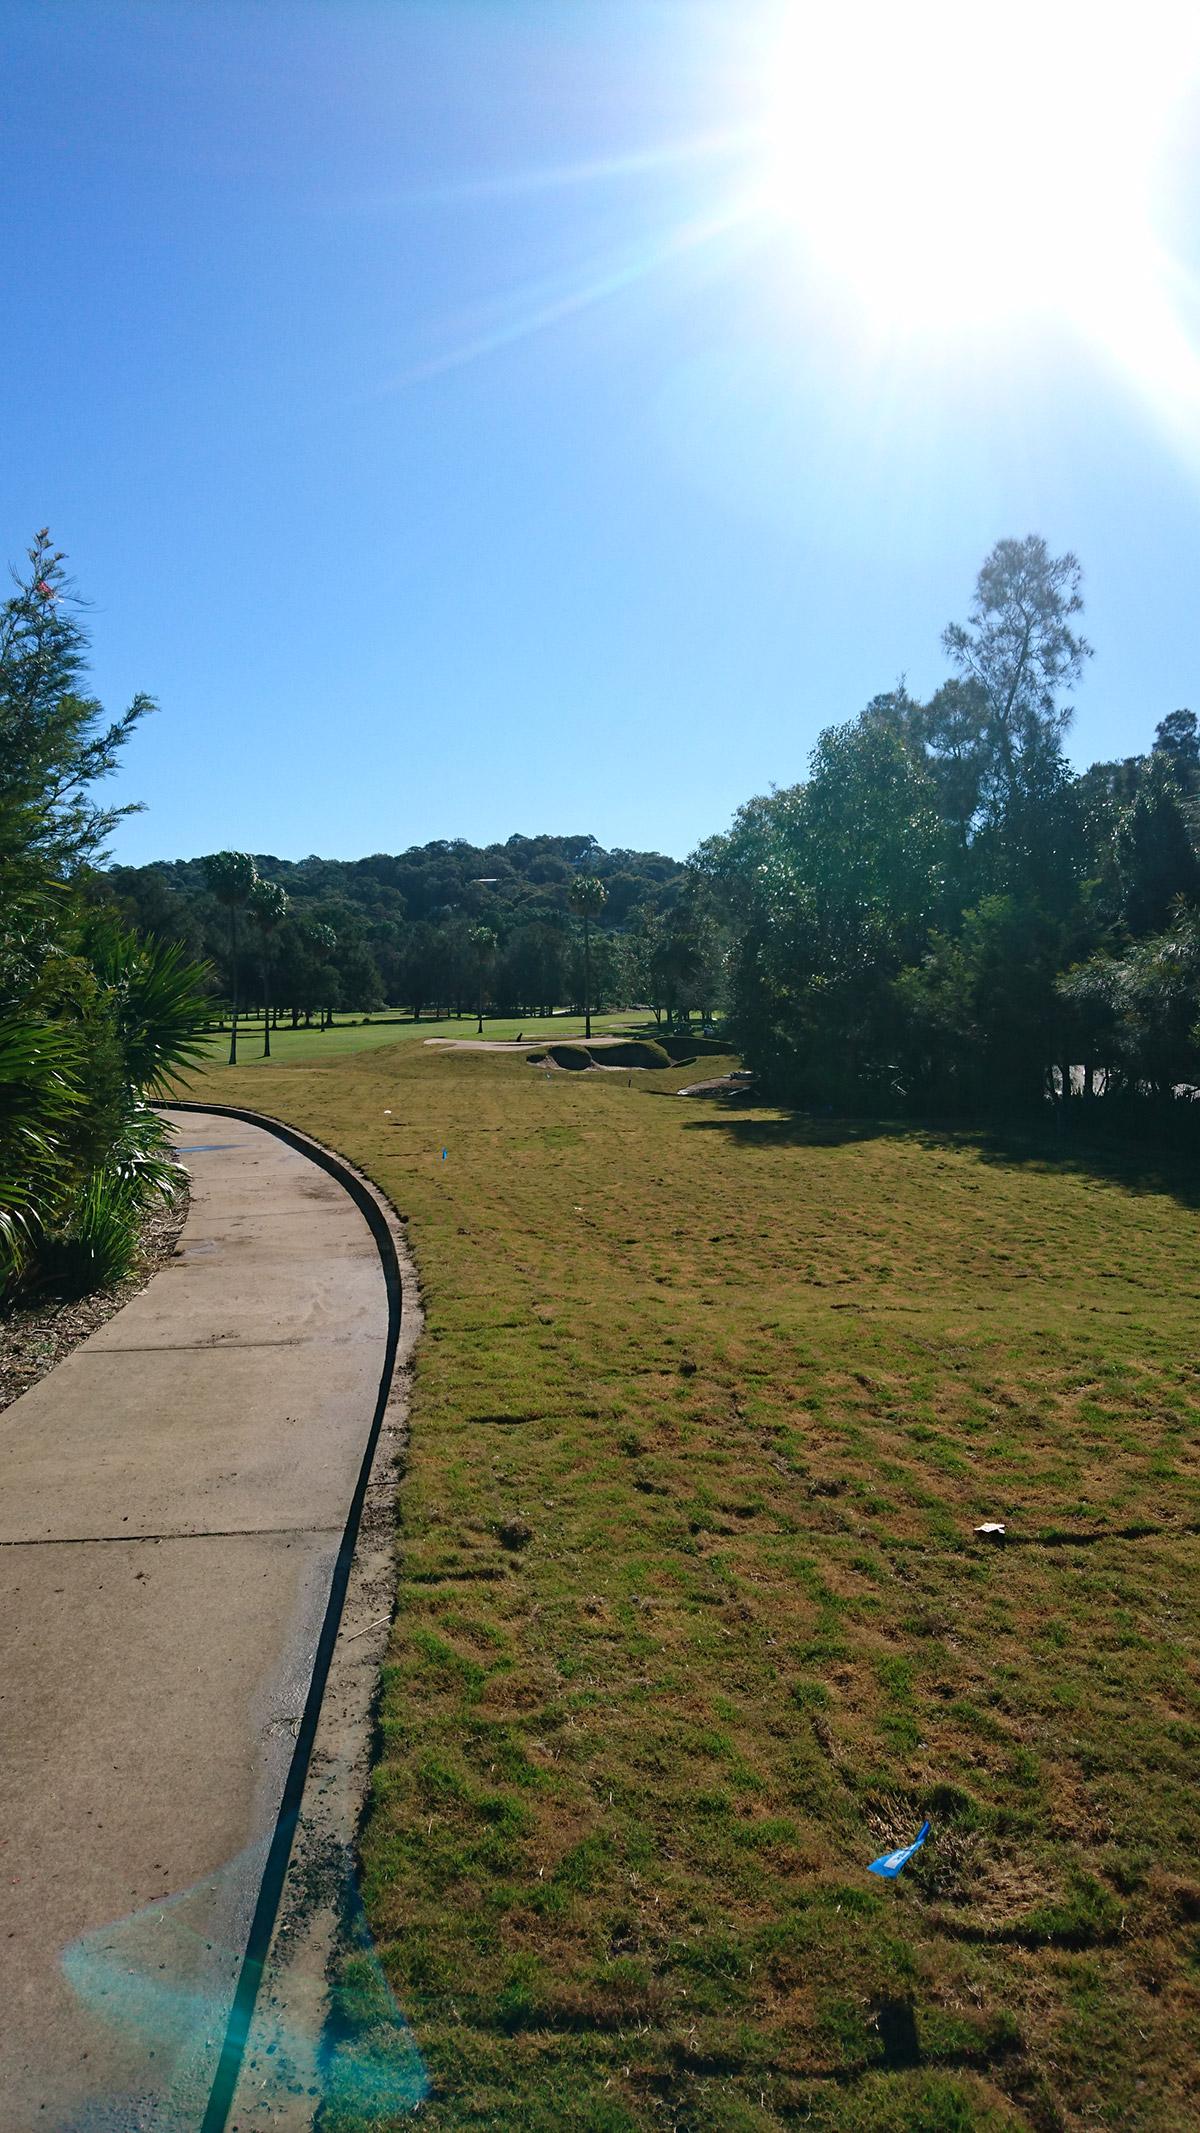 Golf-Spectrum-Practice-Area-Bayview-61